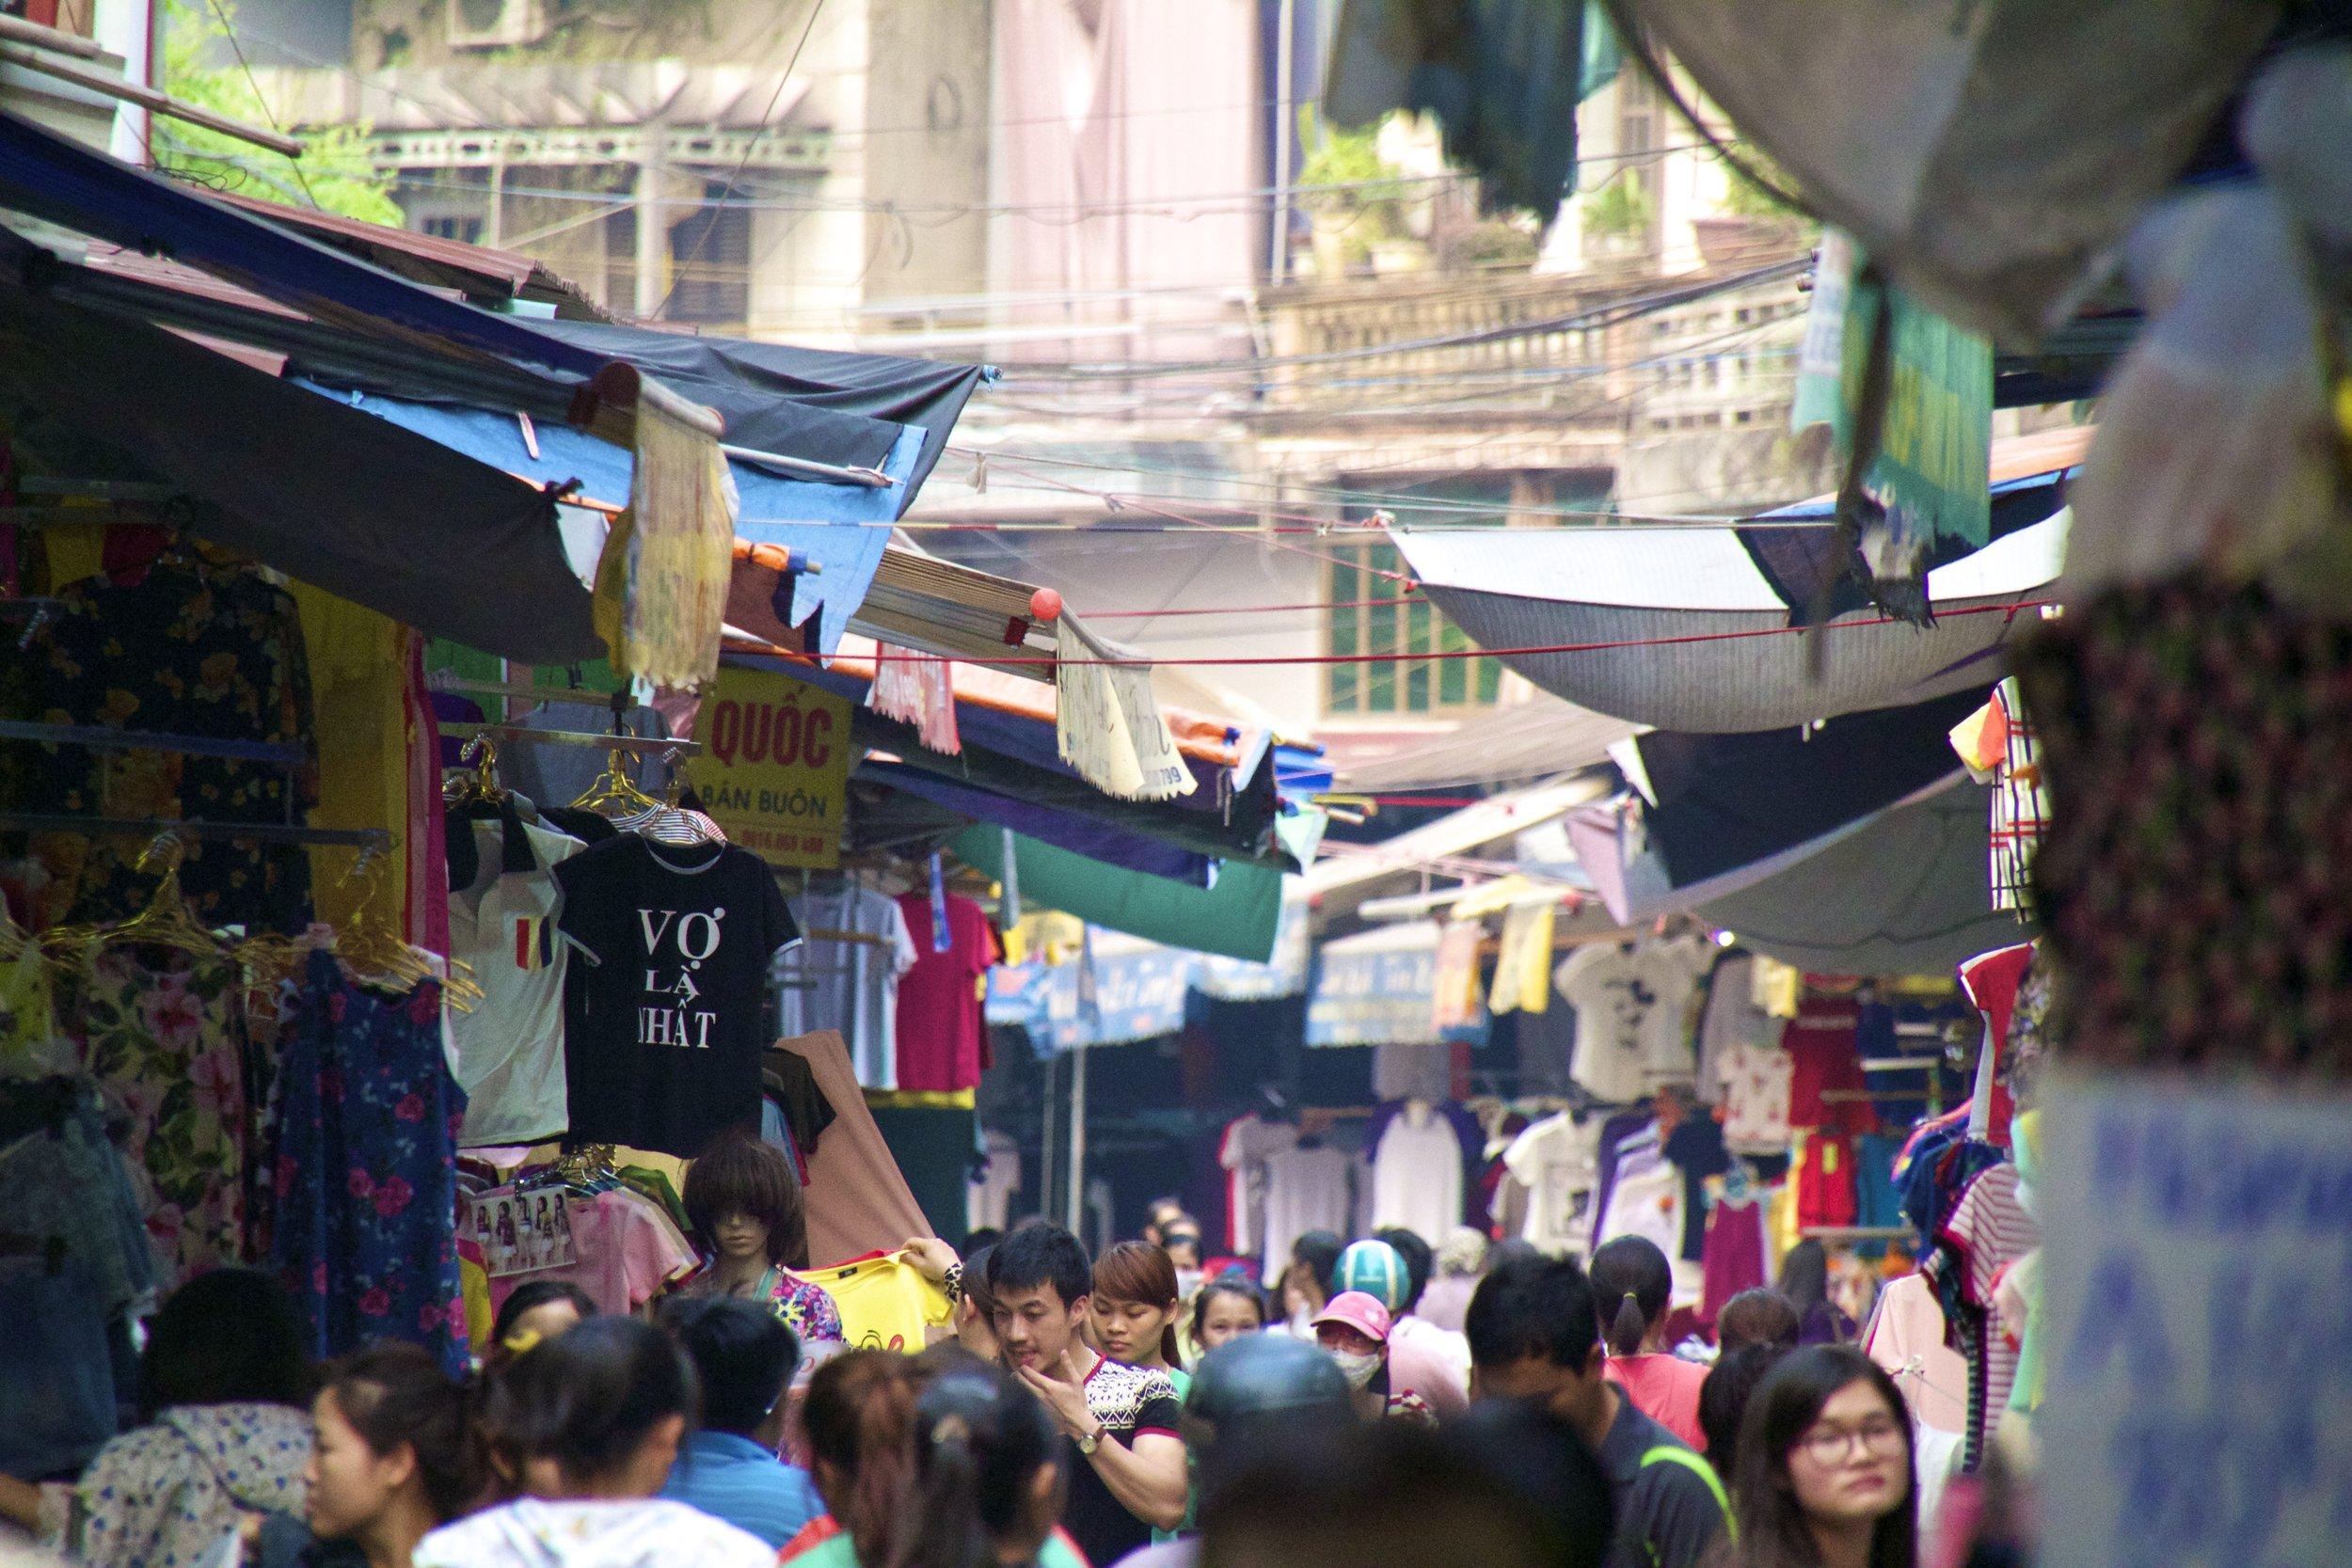 Bac Ninh Vietnam clothes market 2.jpg